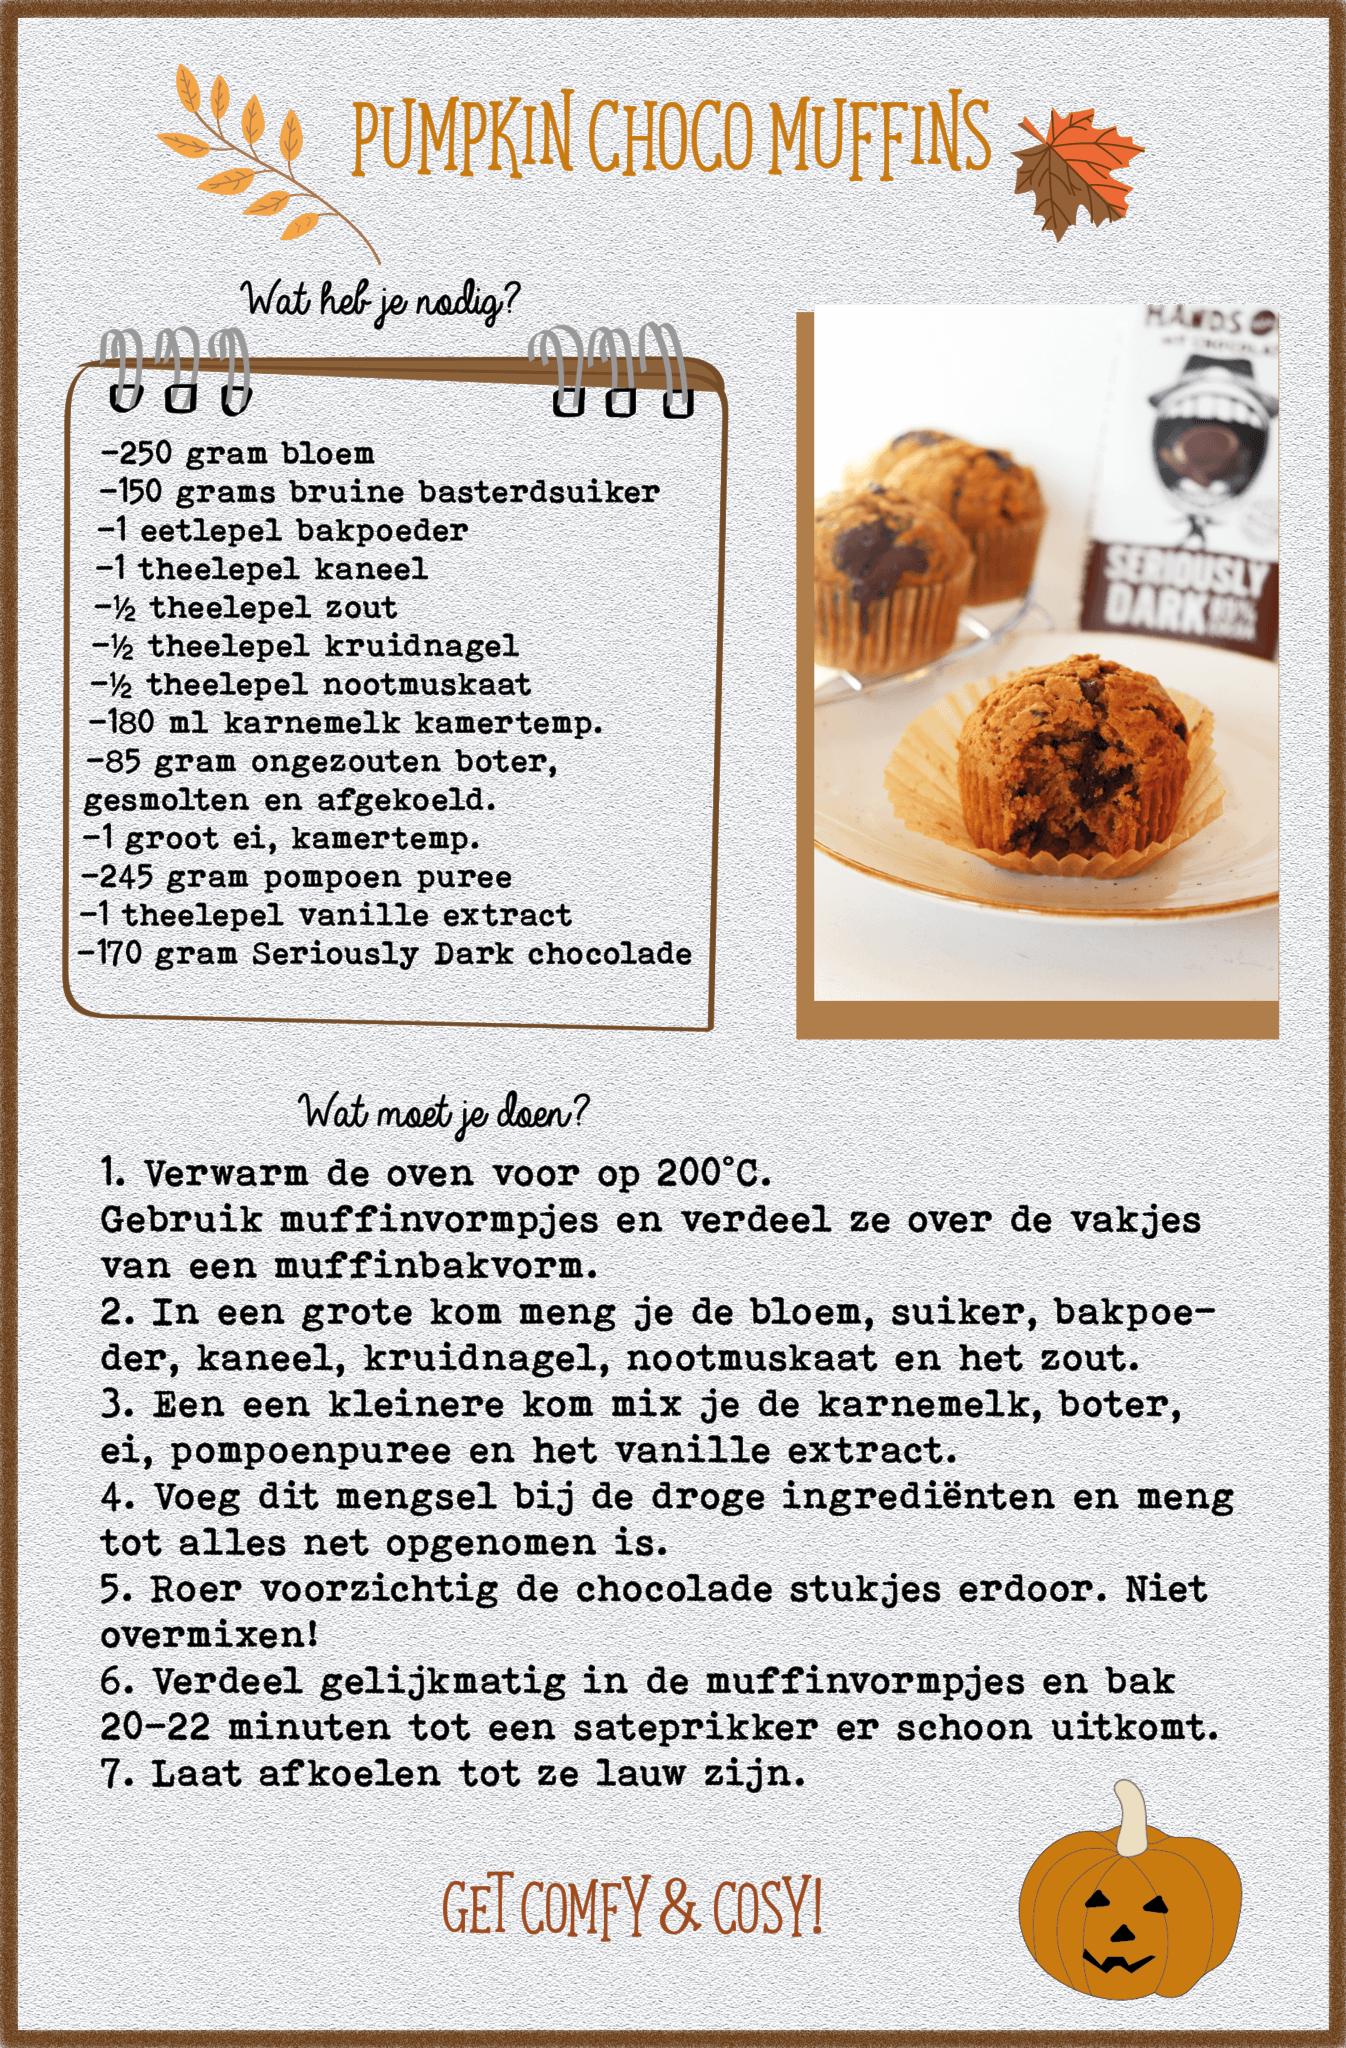 Pumpkin Choco Muffins